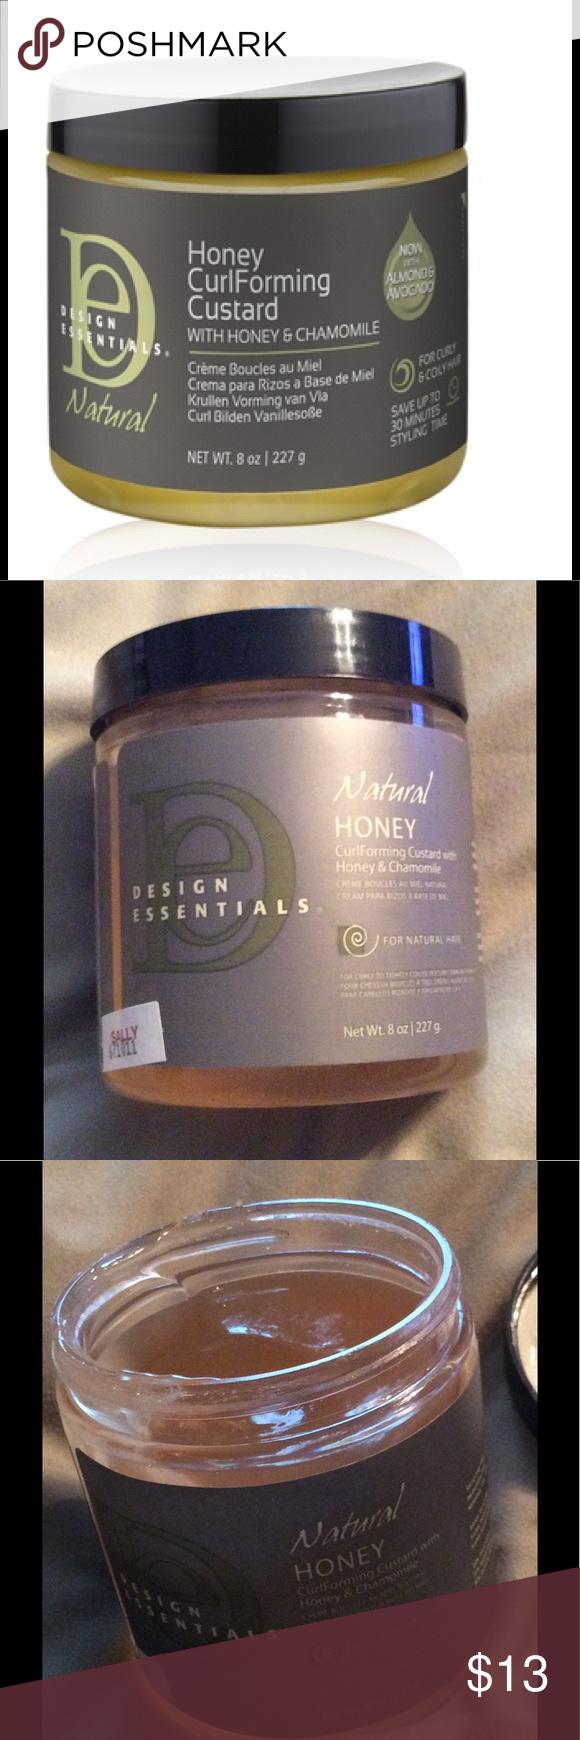 Design Essentials Honey Curl Forming Custard Nwt My Posh Closet